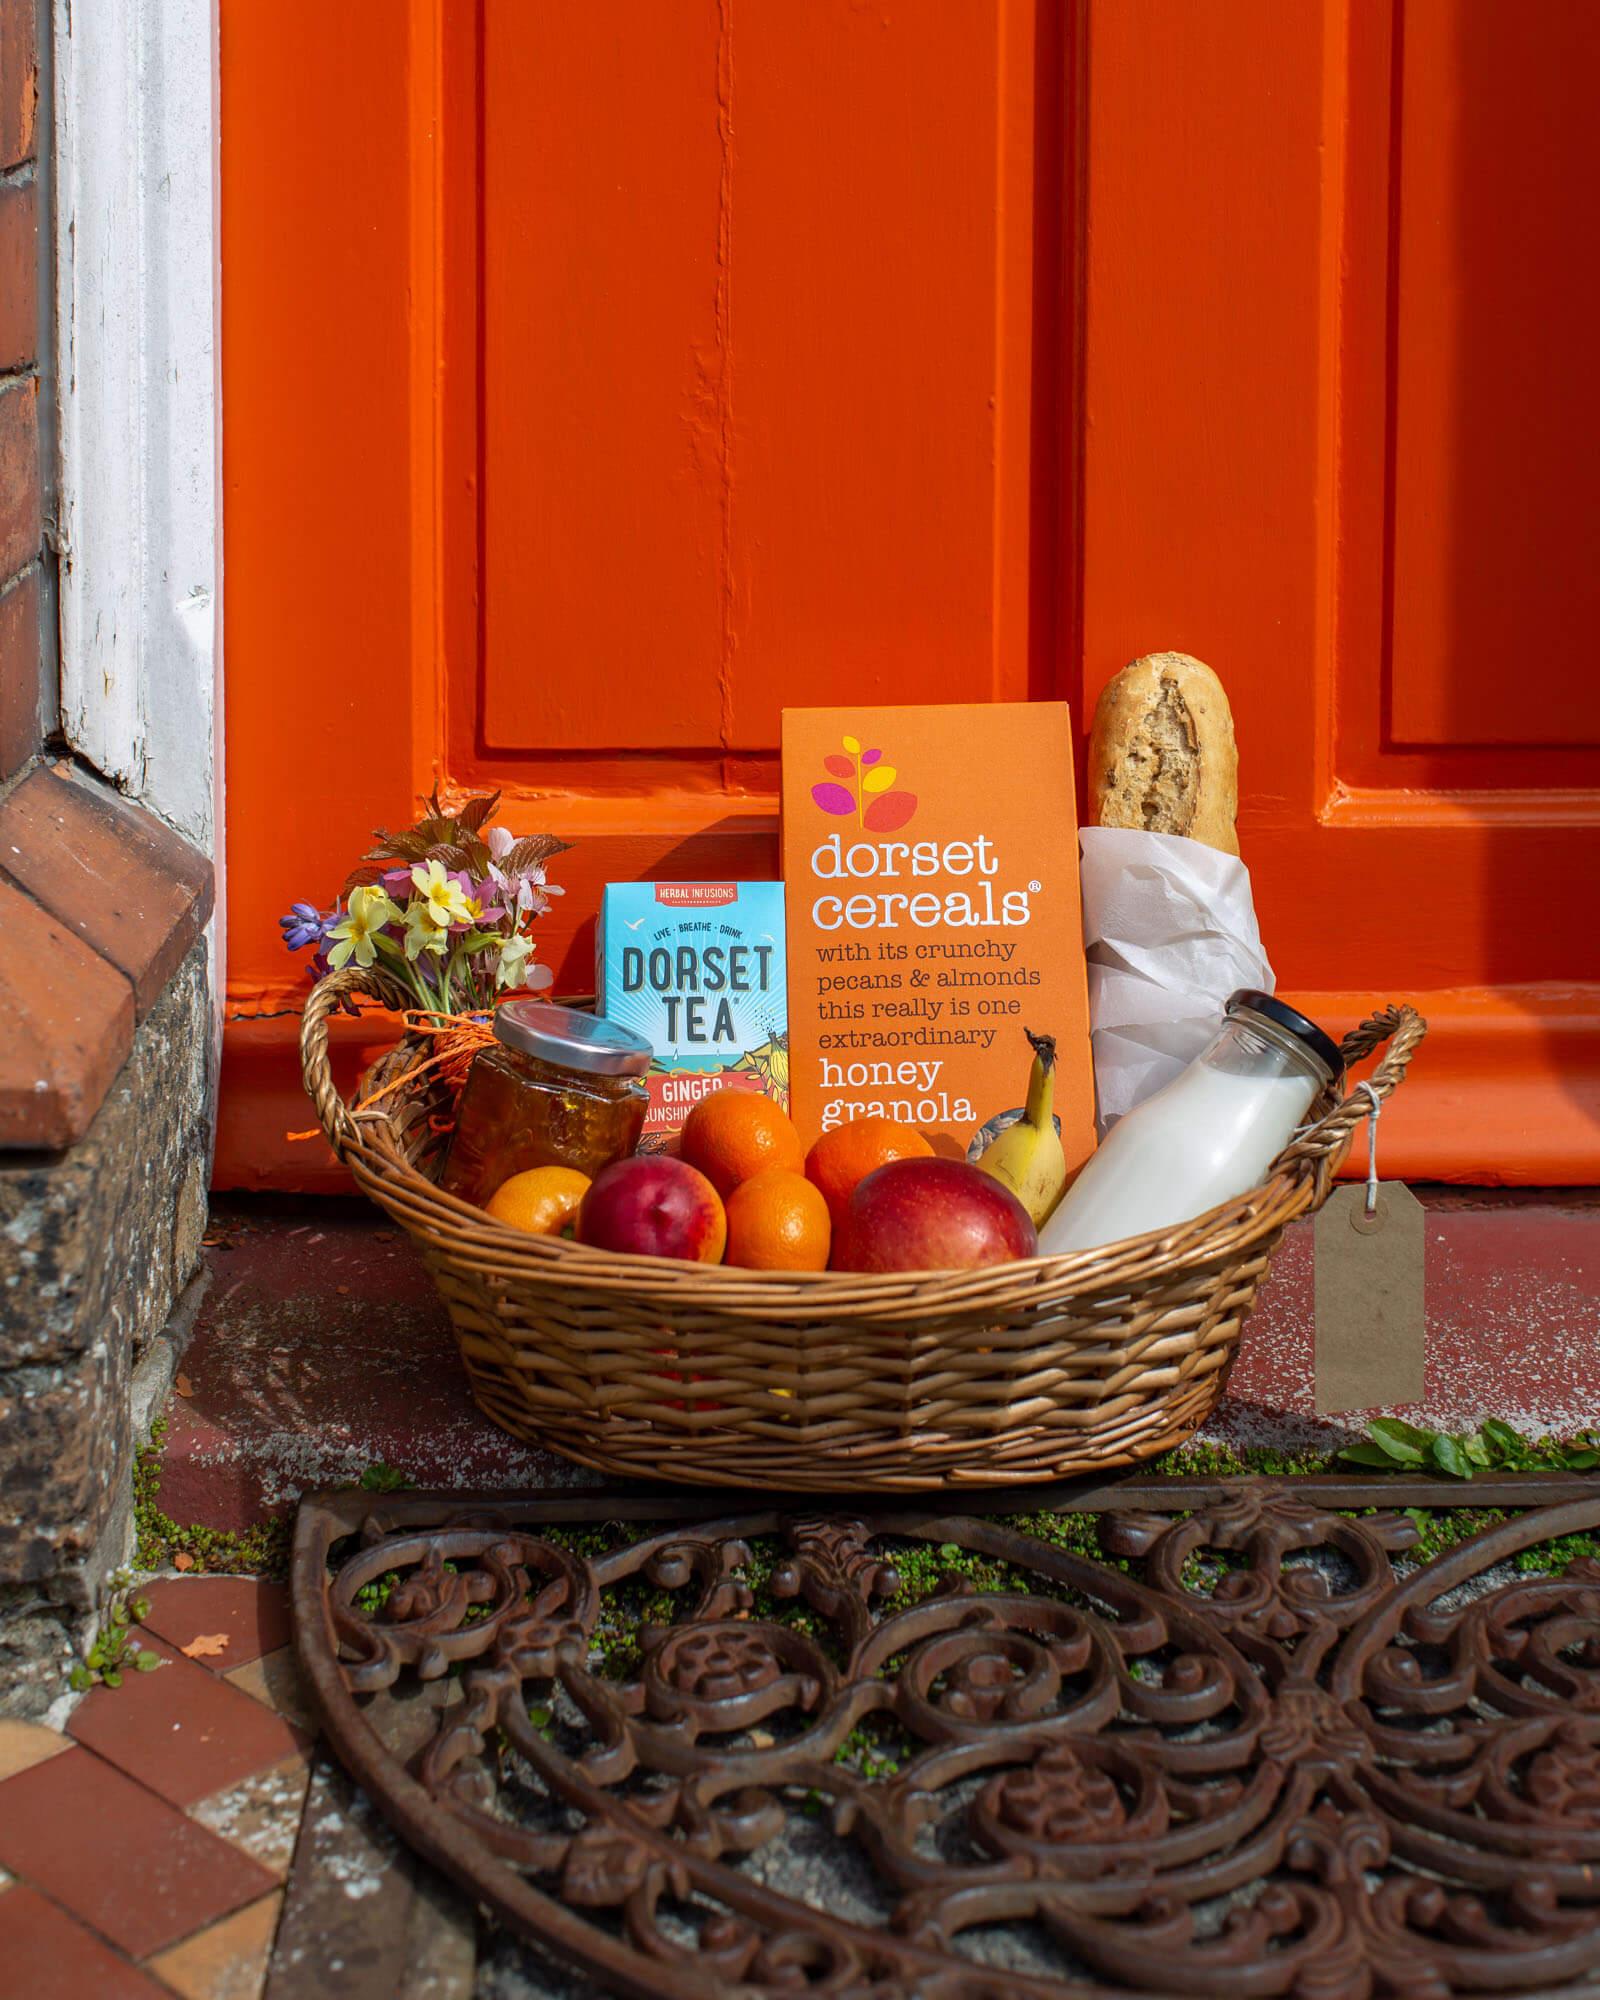 Dorset Tea Dorset cereals- product photography-Lara Jane Thorpe